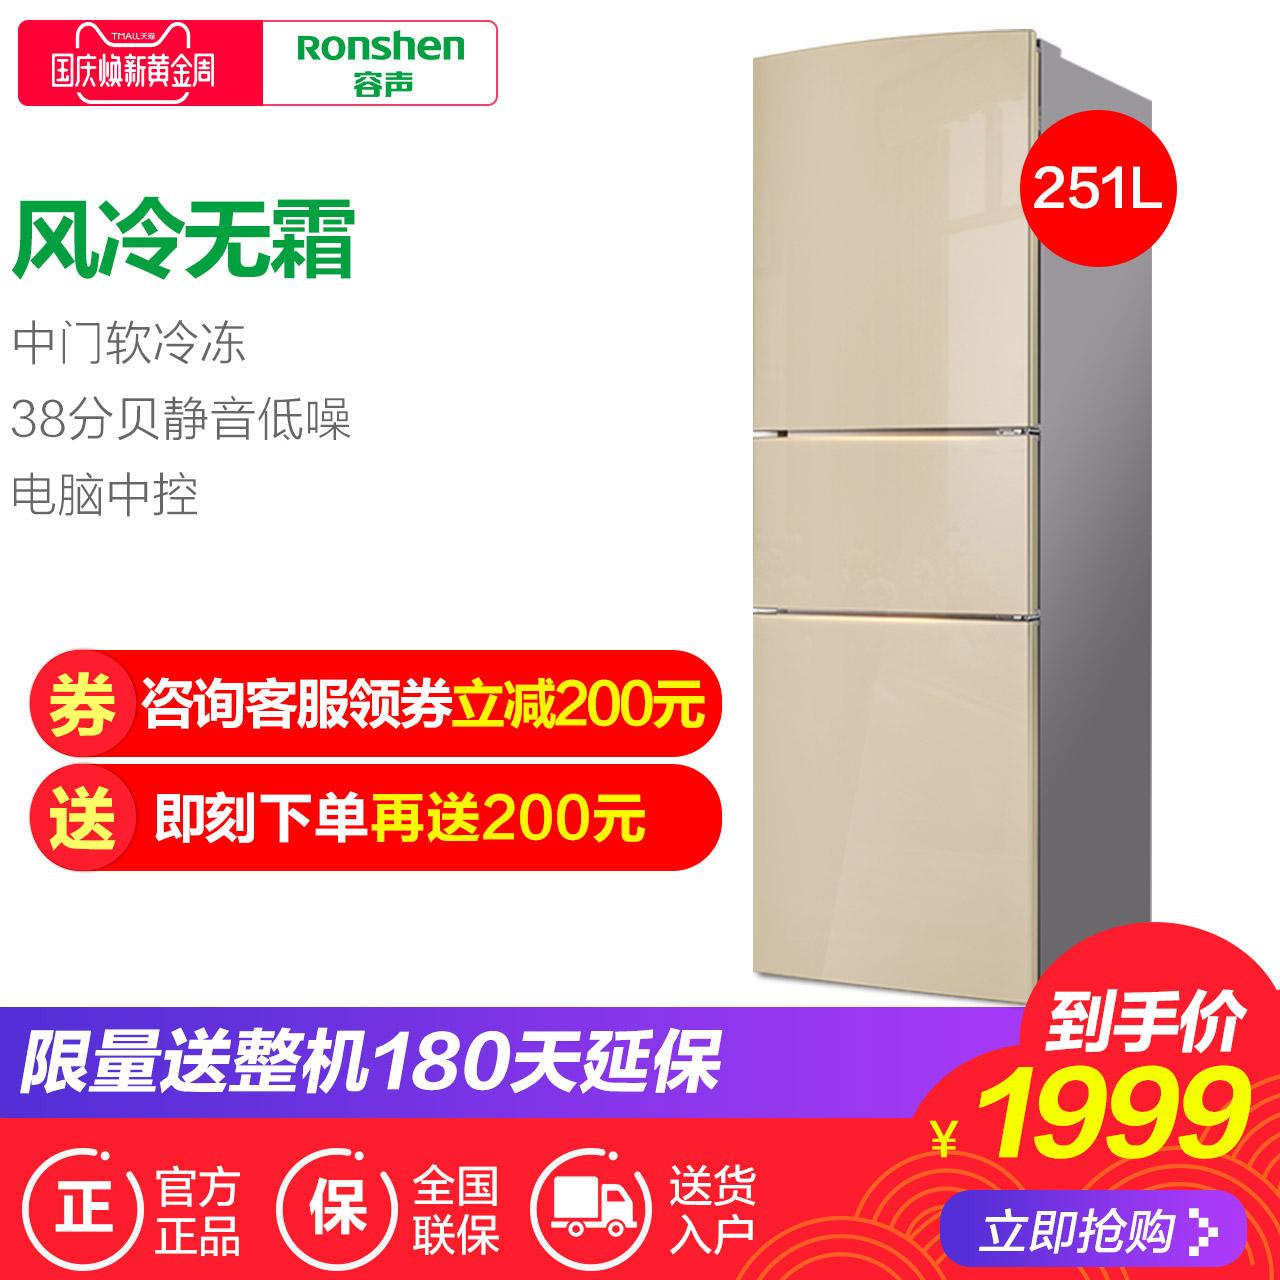 Ronshen-容声 BCD-251WKD1NY风冷无霜三开门电冰箱三门家用小型